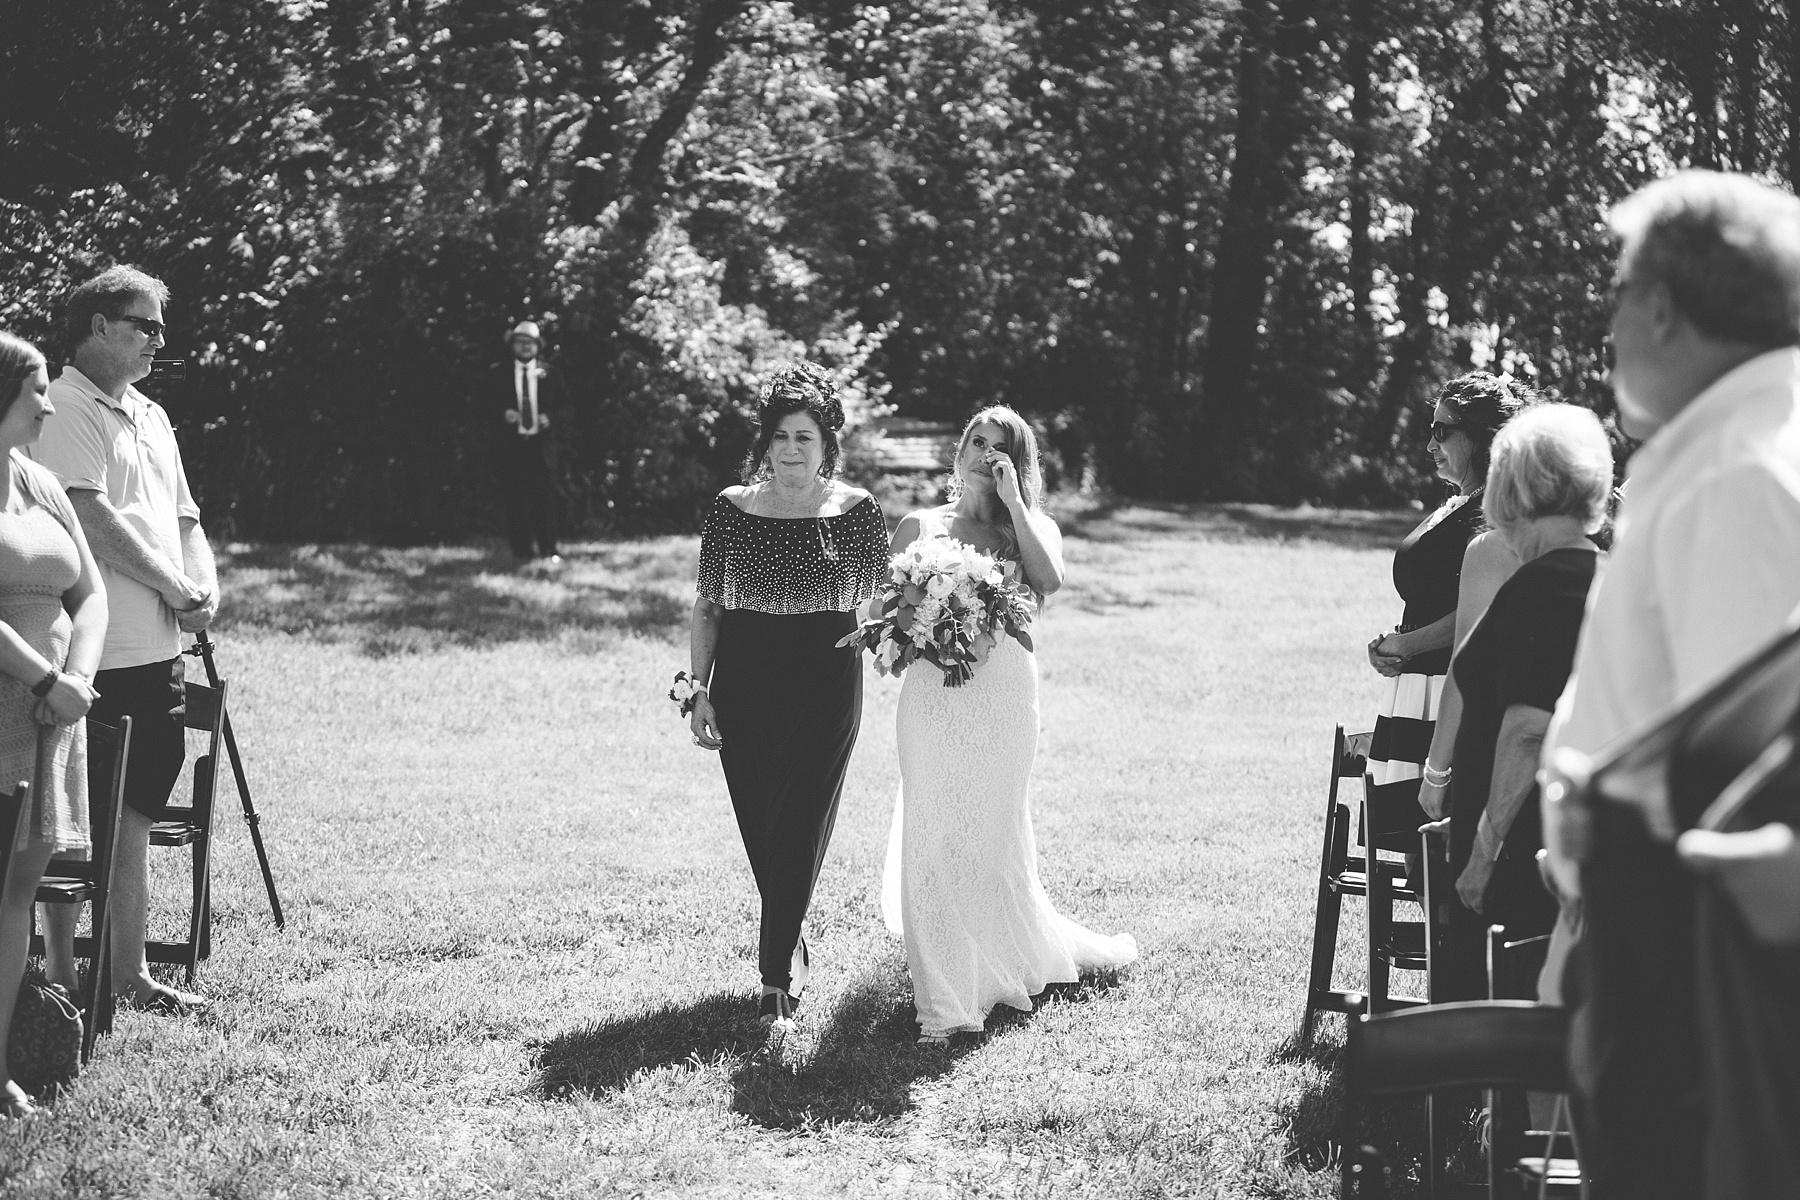 Brandon_Shafer_Photography_Kara_Doug_12_corners_Wedding_Benton_Harbor_0038.jpg